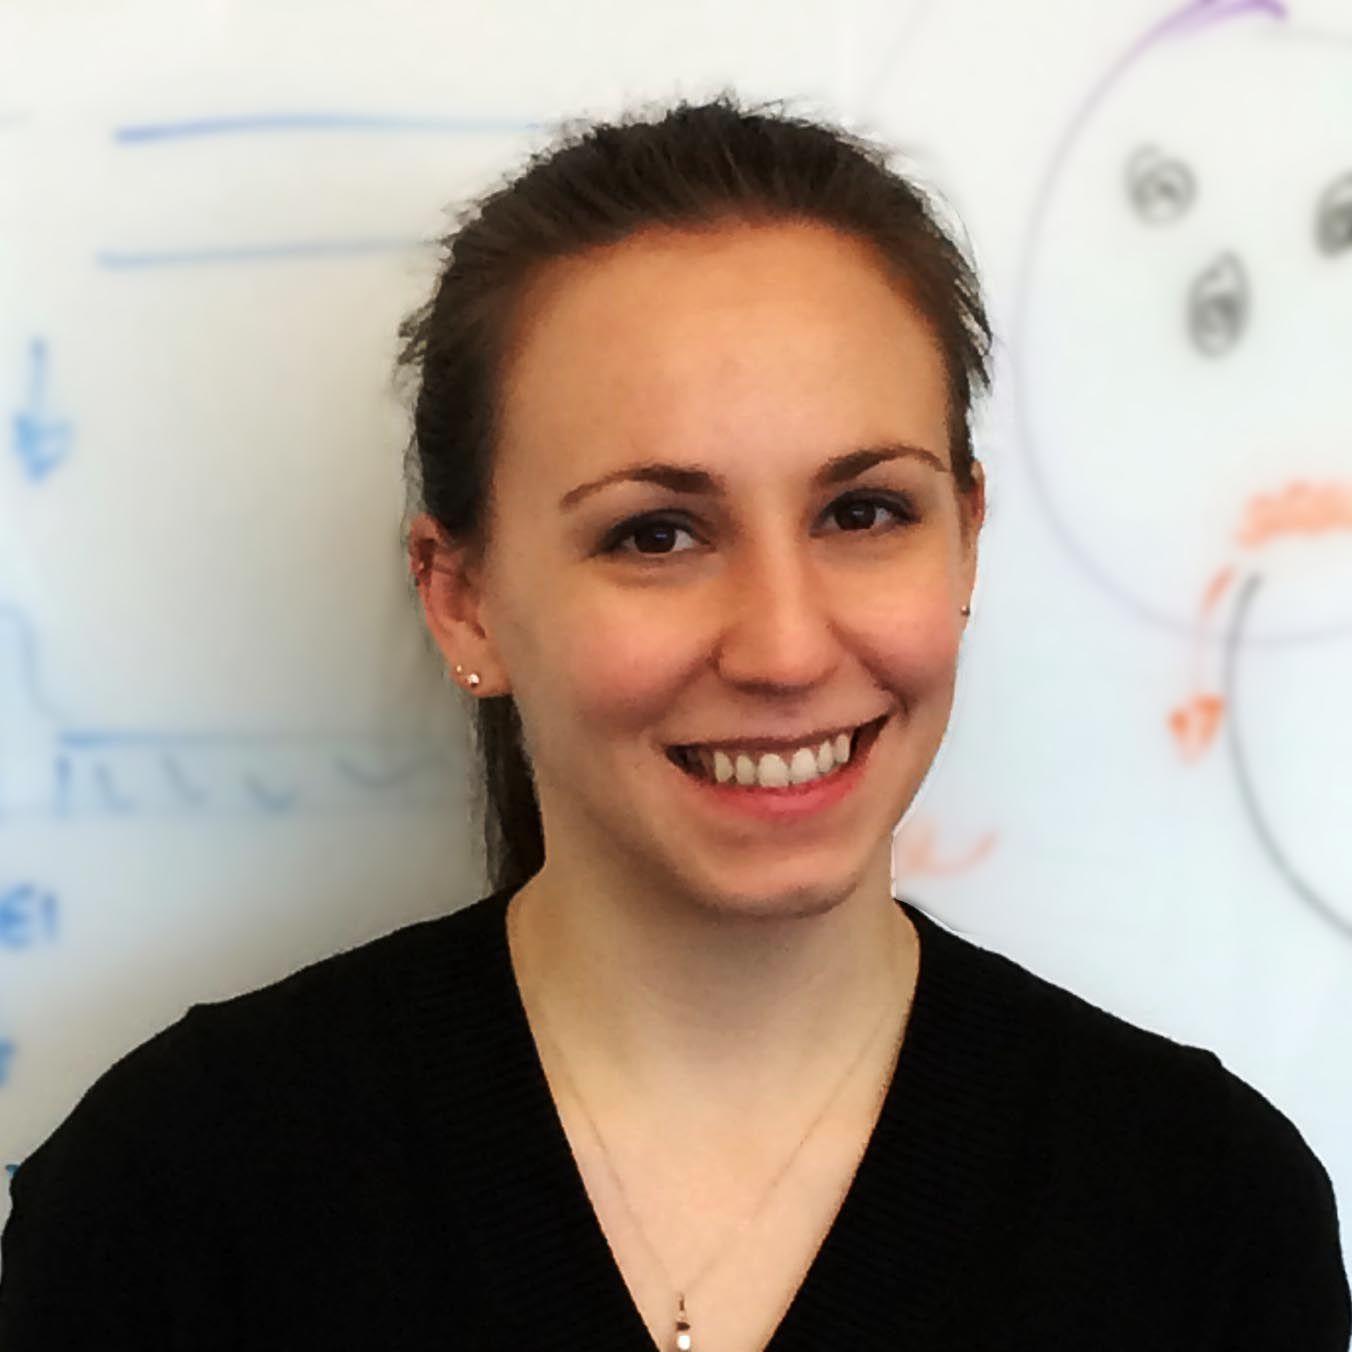 Headshot of Megan Hochstrasser